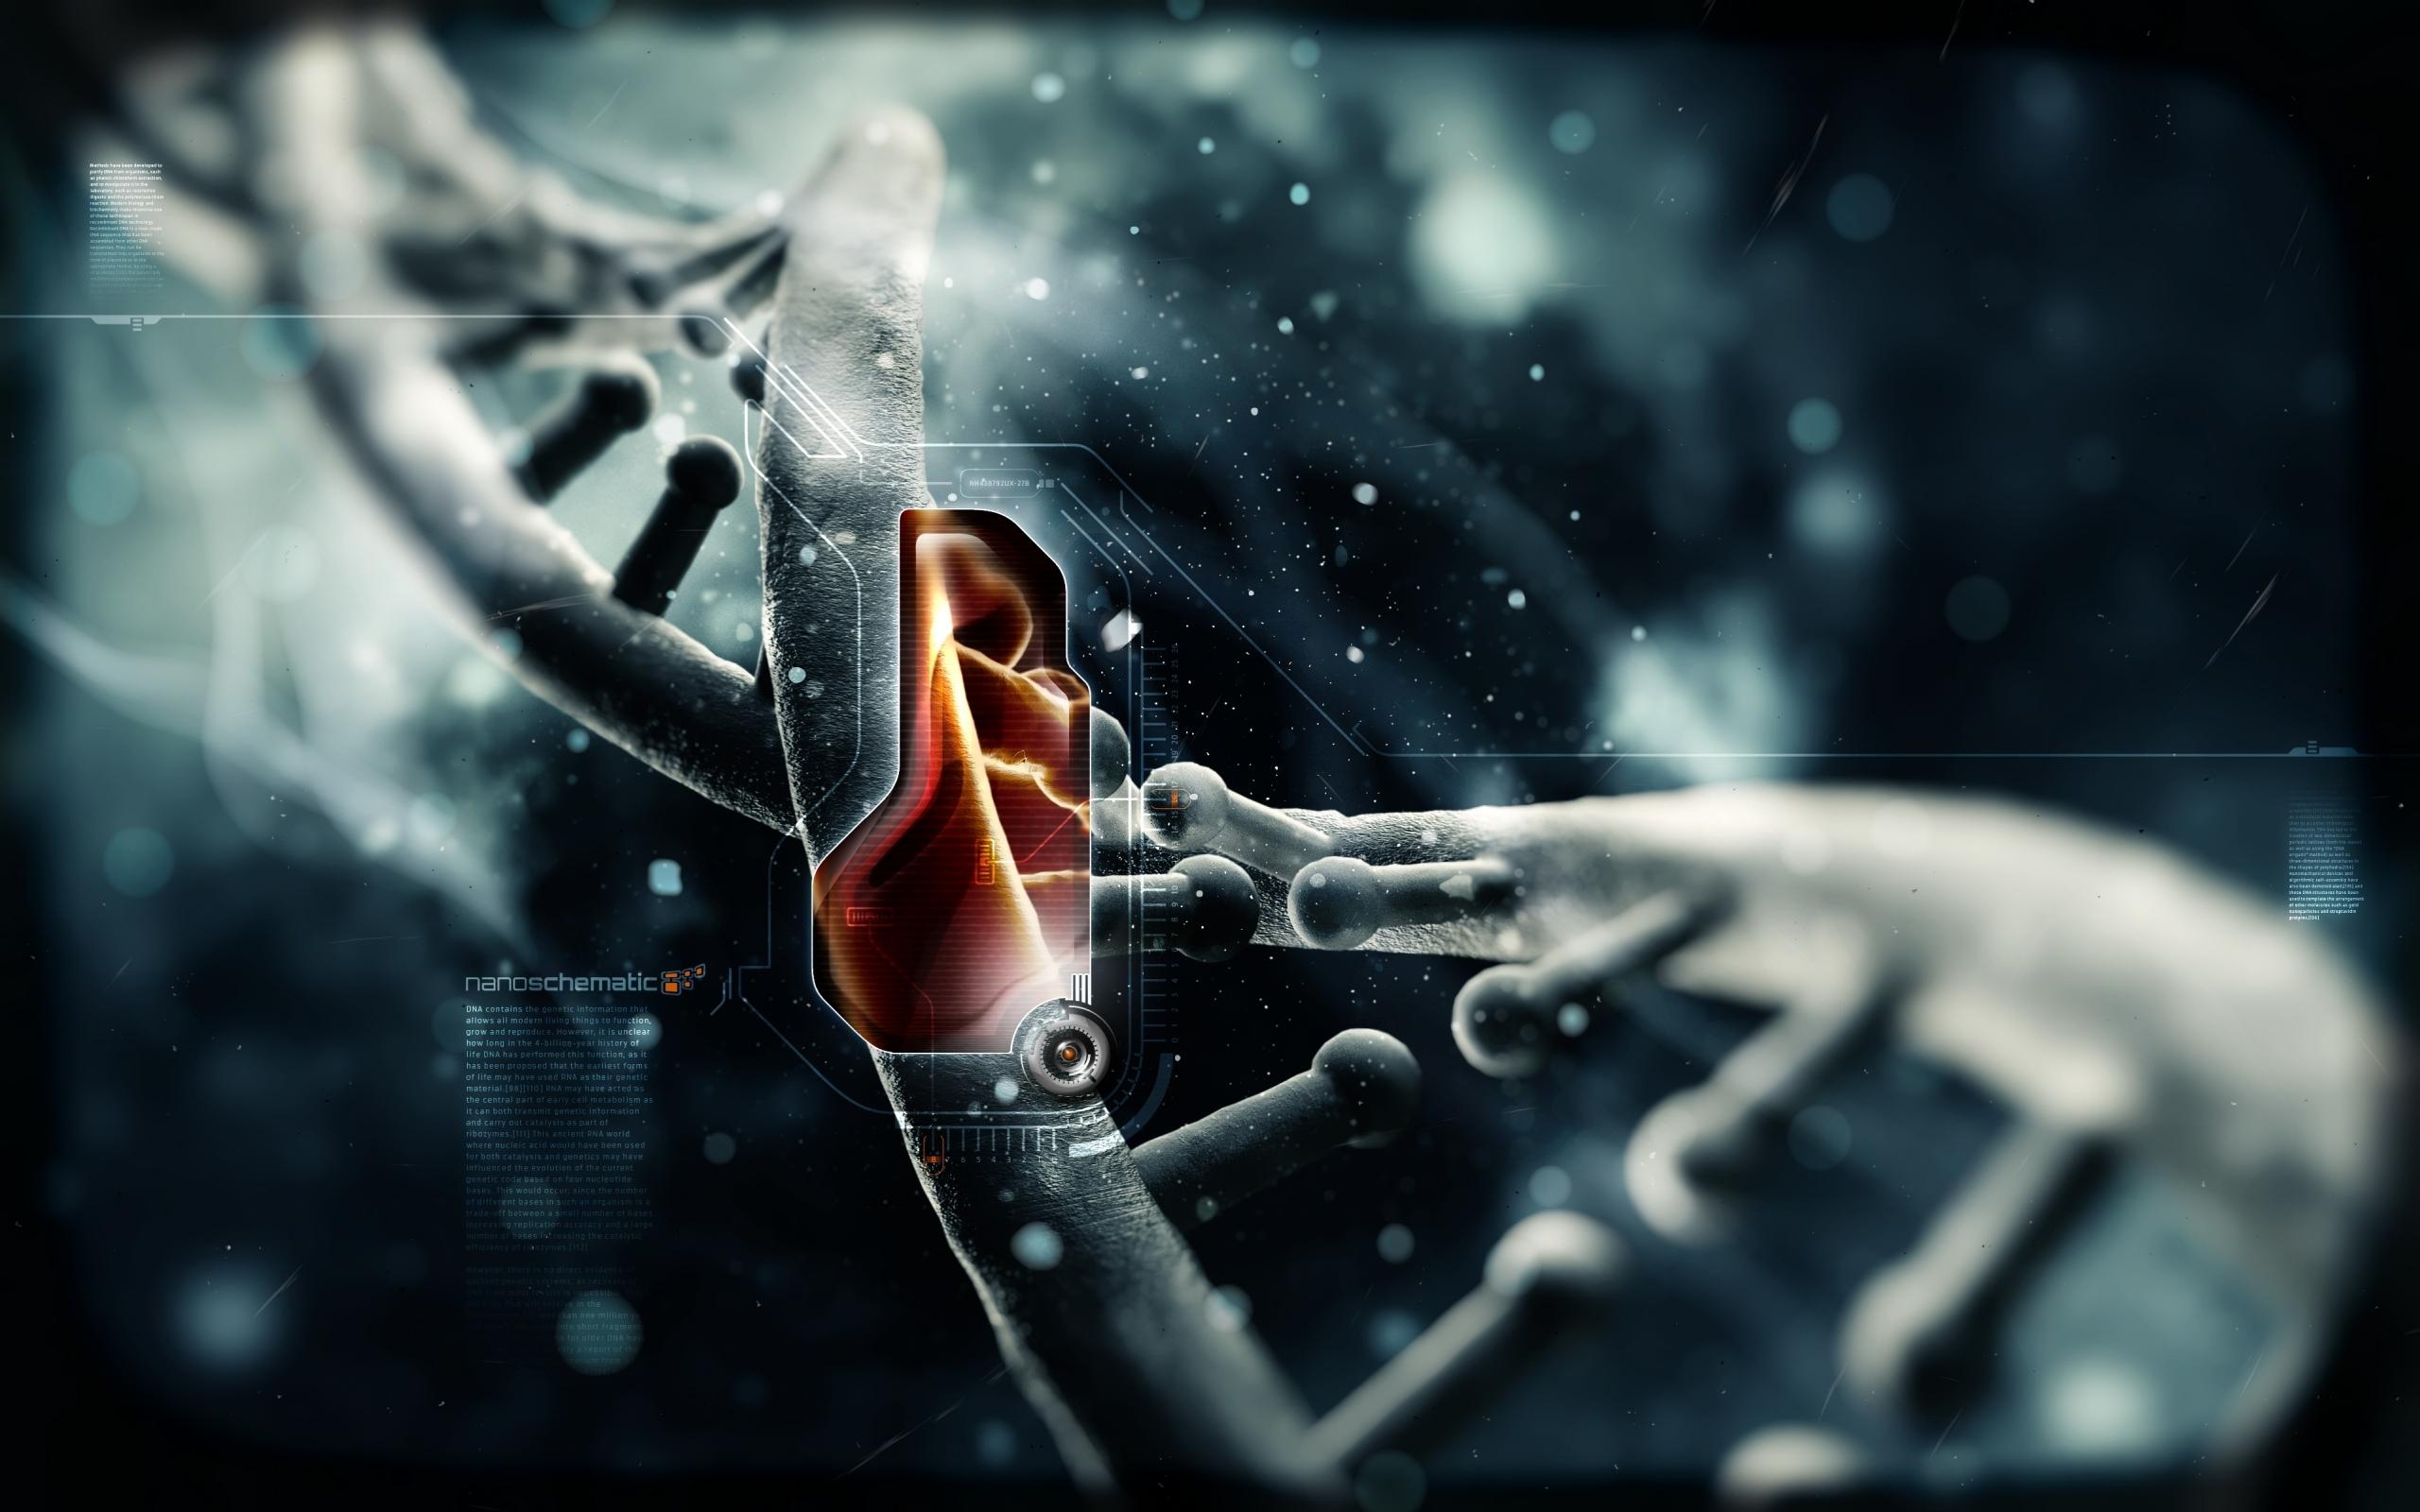 General 2560x1600 DNA digital art science technology render CGI 3D